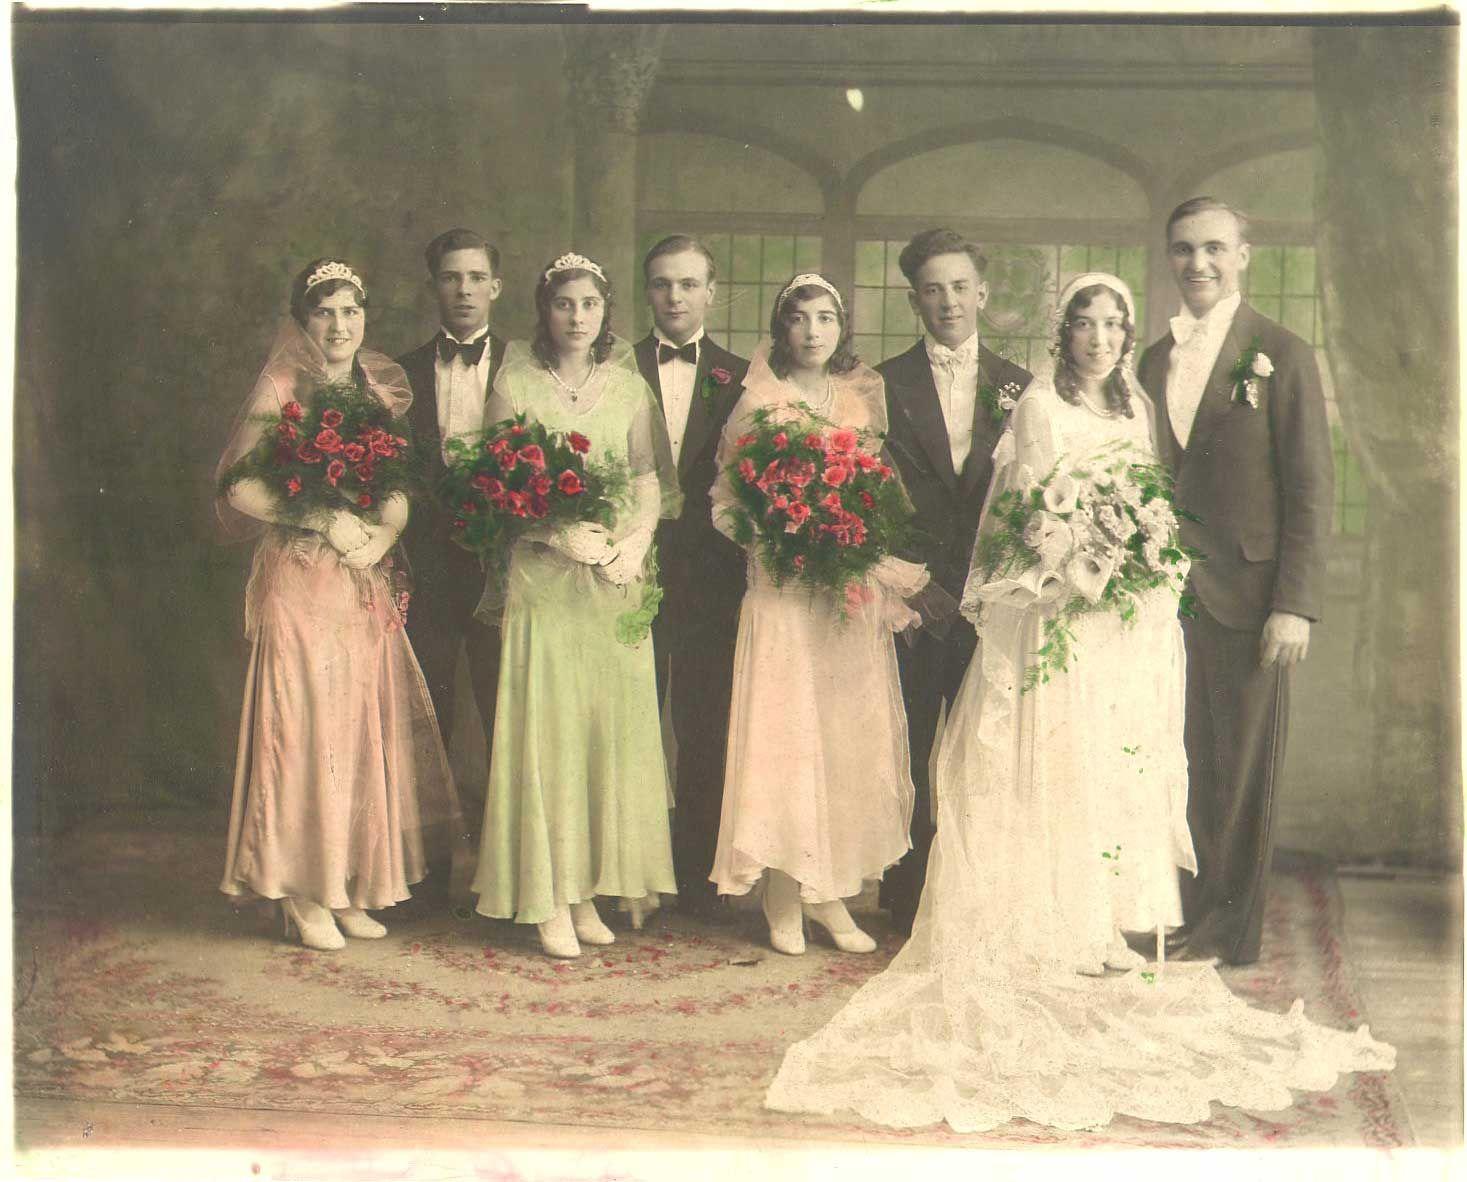 1930 wedding dress   Wedding  The Big Day  Pinterest  Vintage weddings Weddings